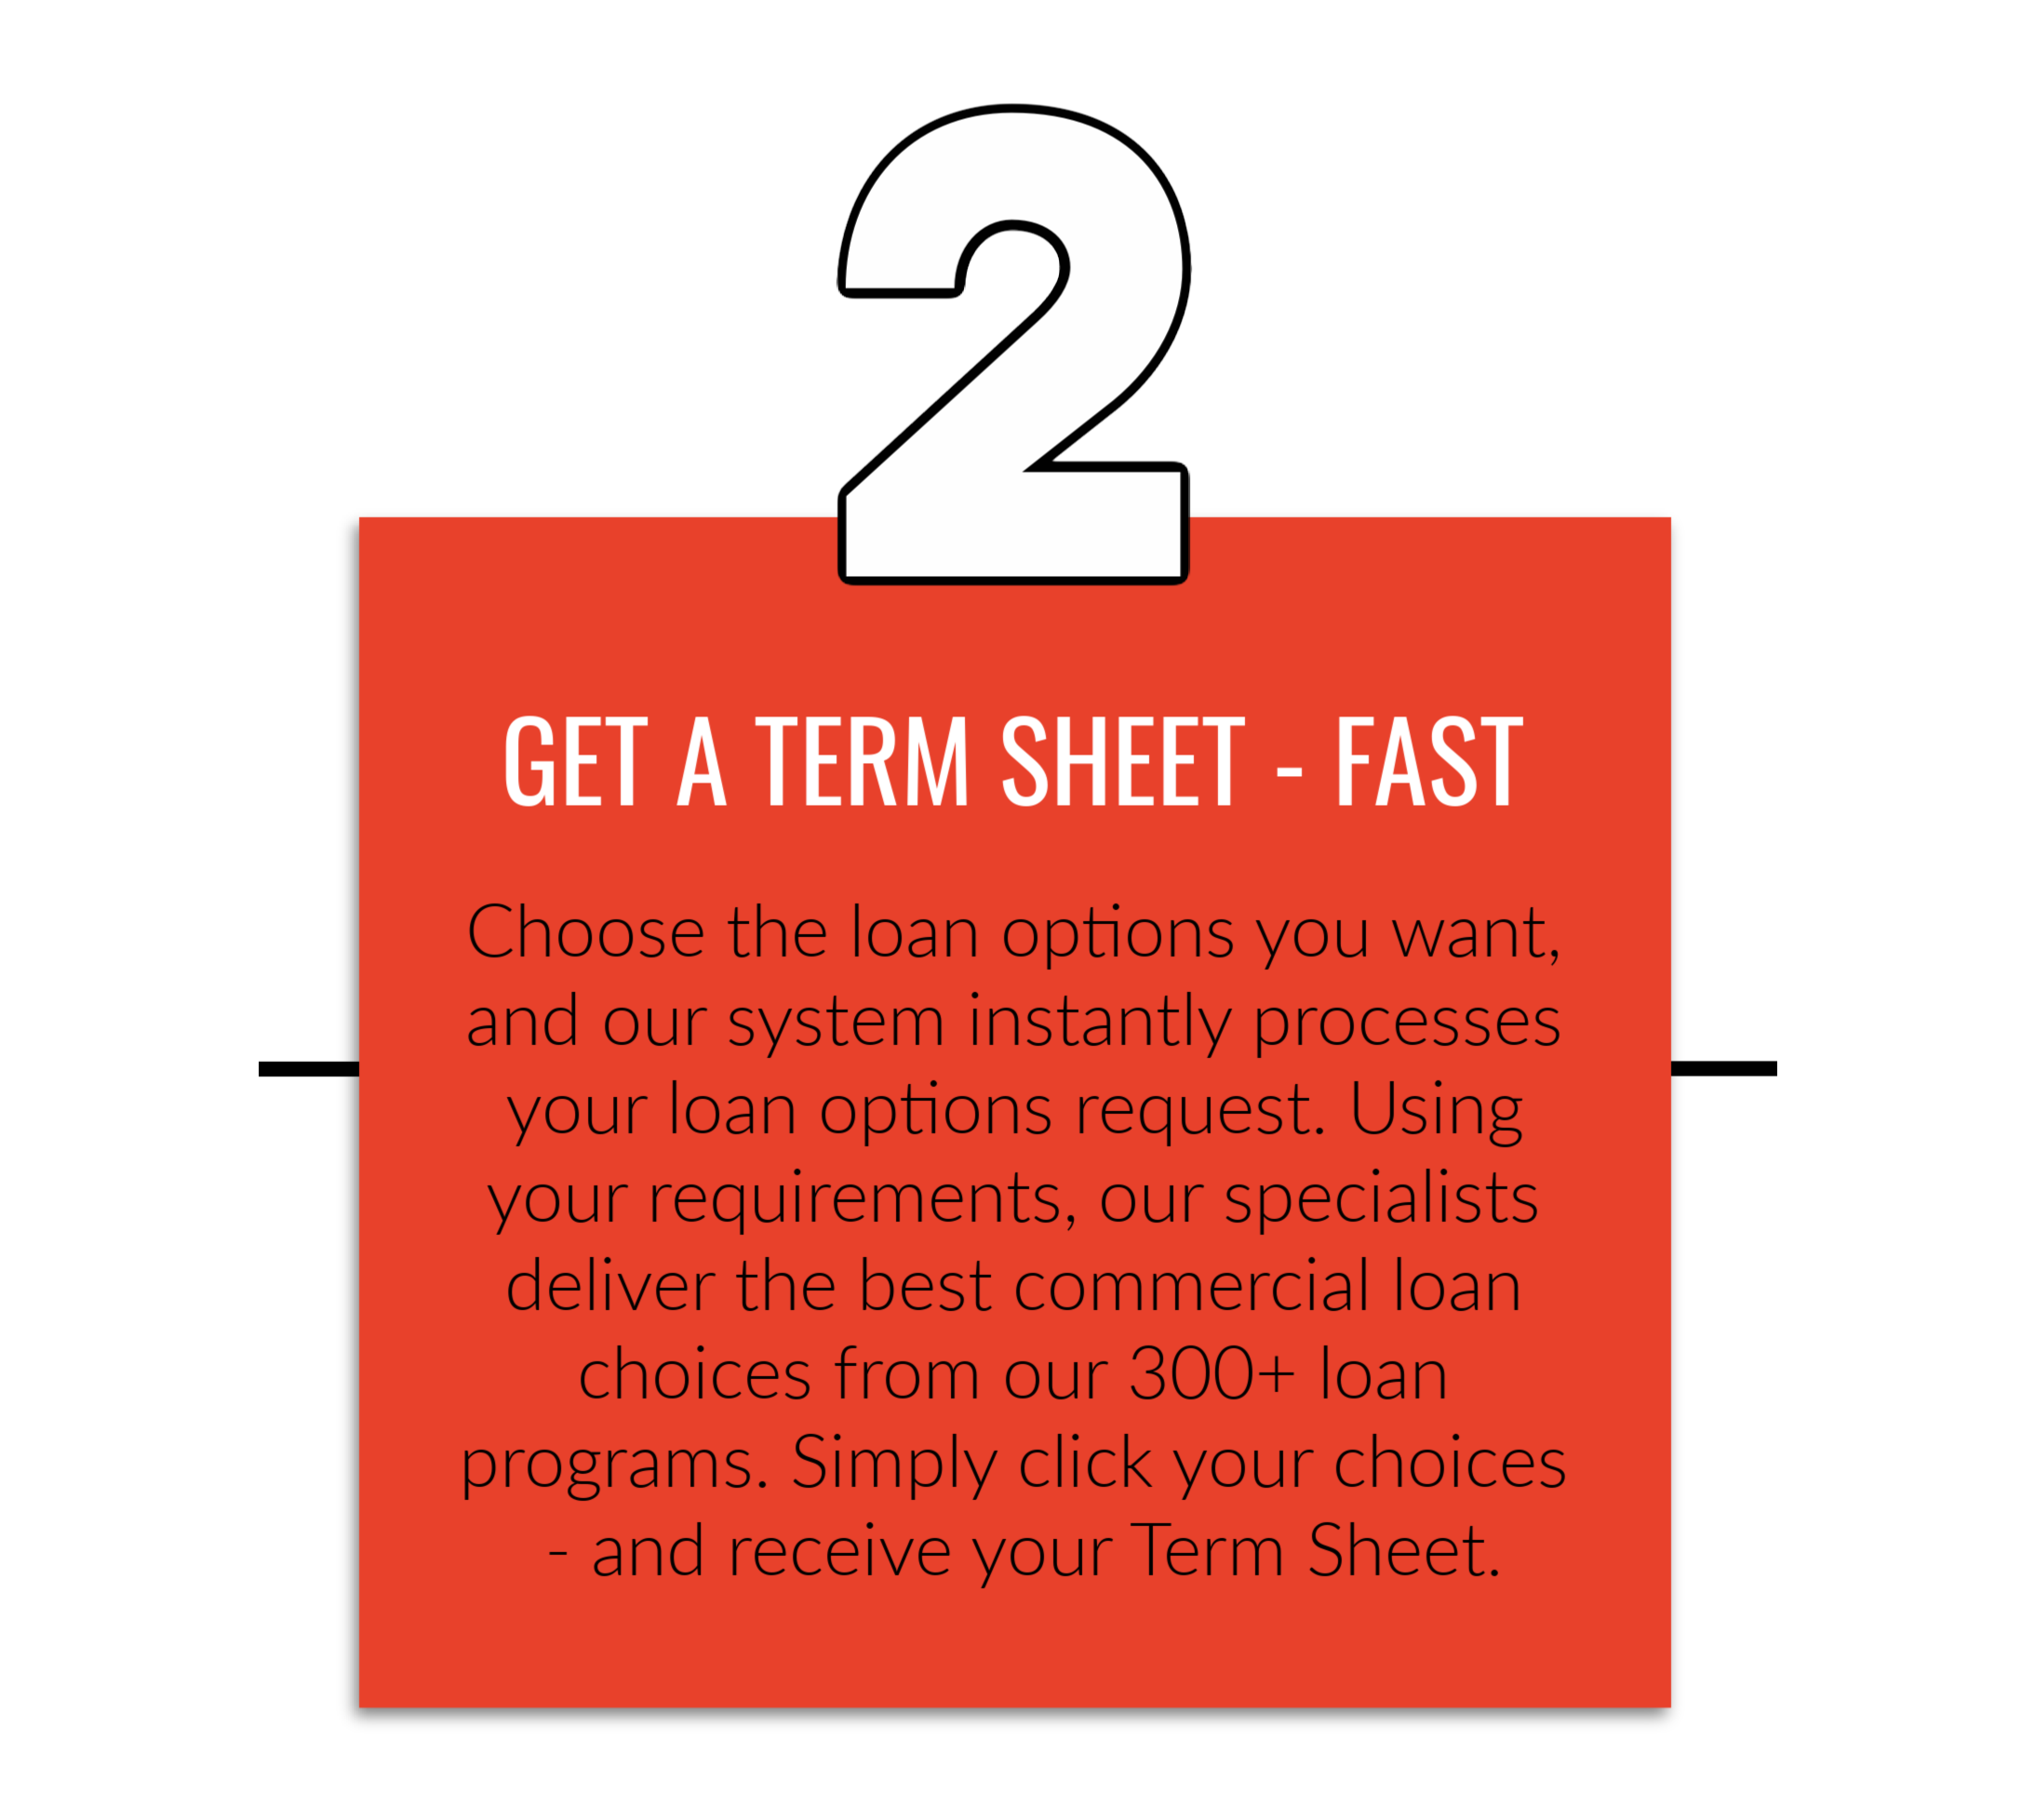 Our Process: Step 2, Get a Term Sheet